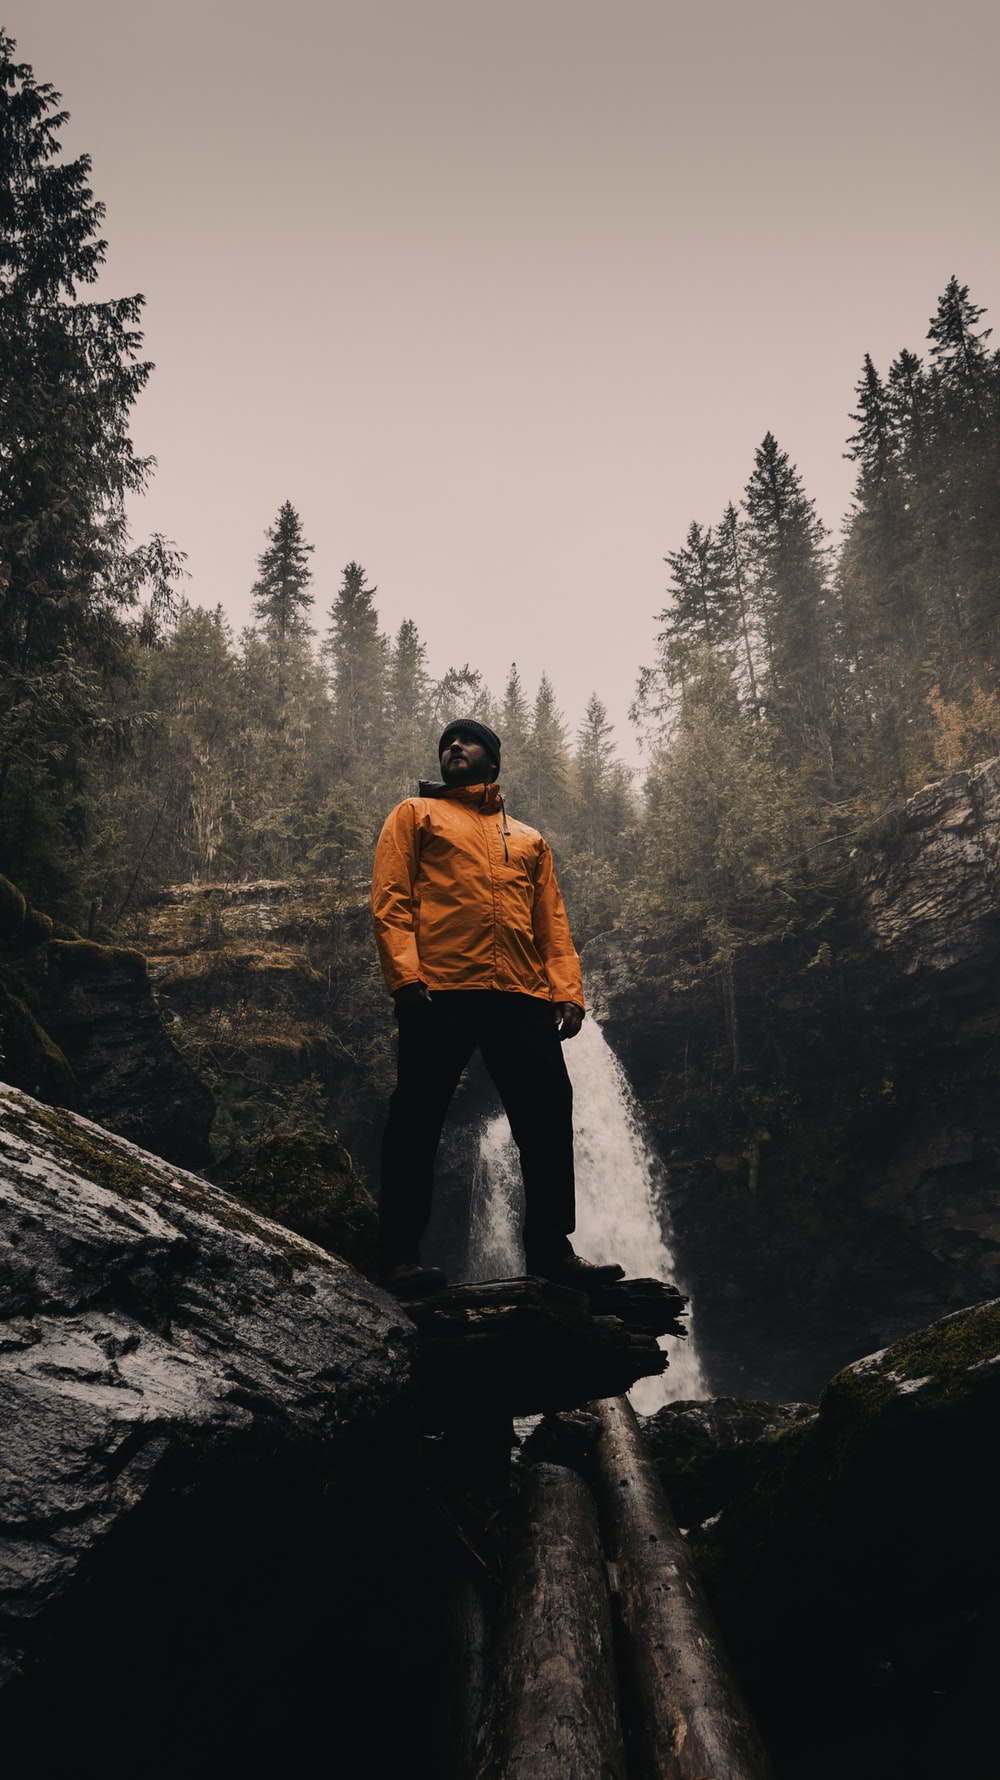 man in brown jacket standing on rock near waterfalls during daytime